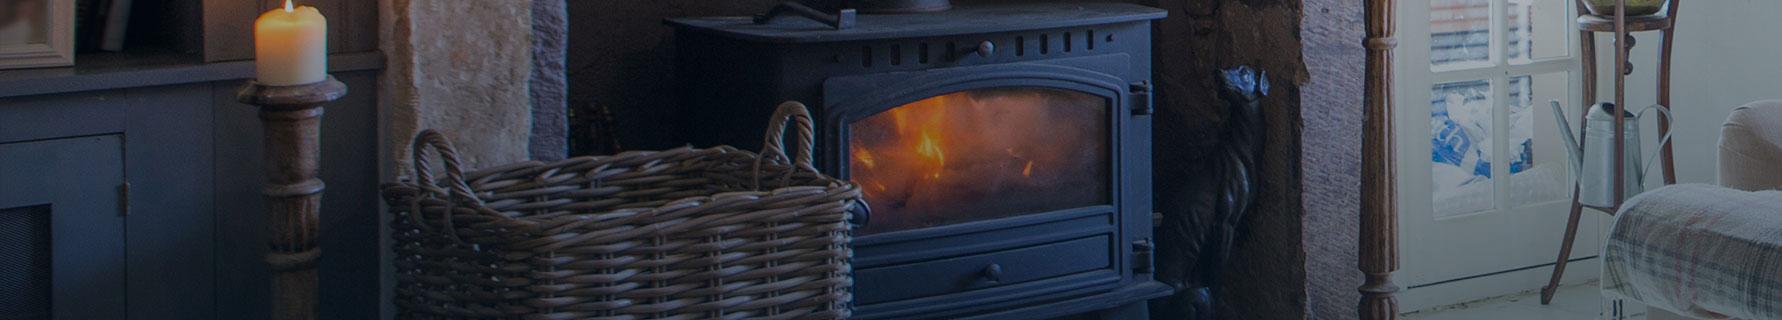 Hearth Fireplaces And Stoves Nehpba Members Ma Ny Ct